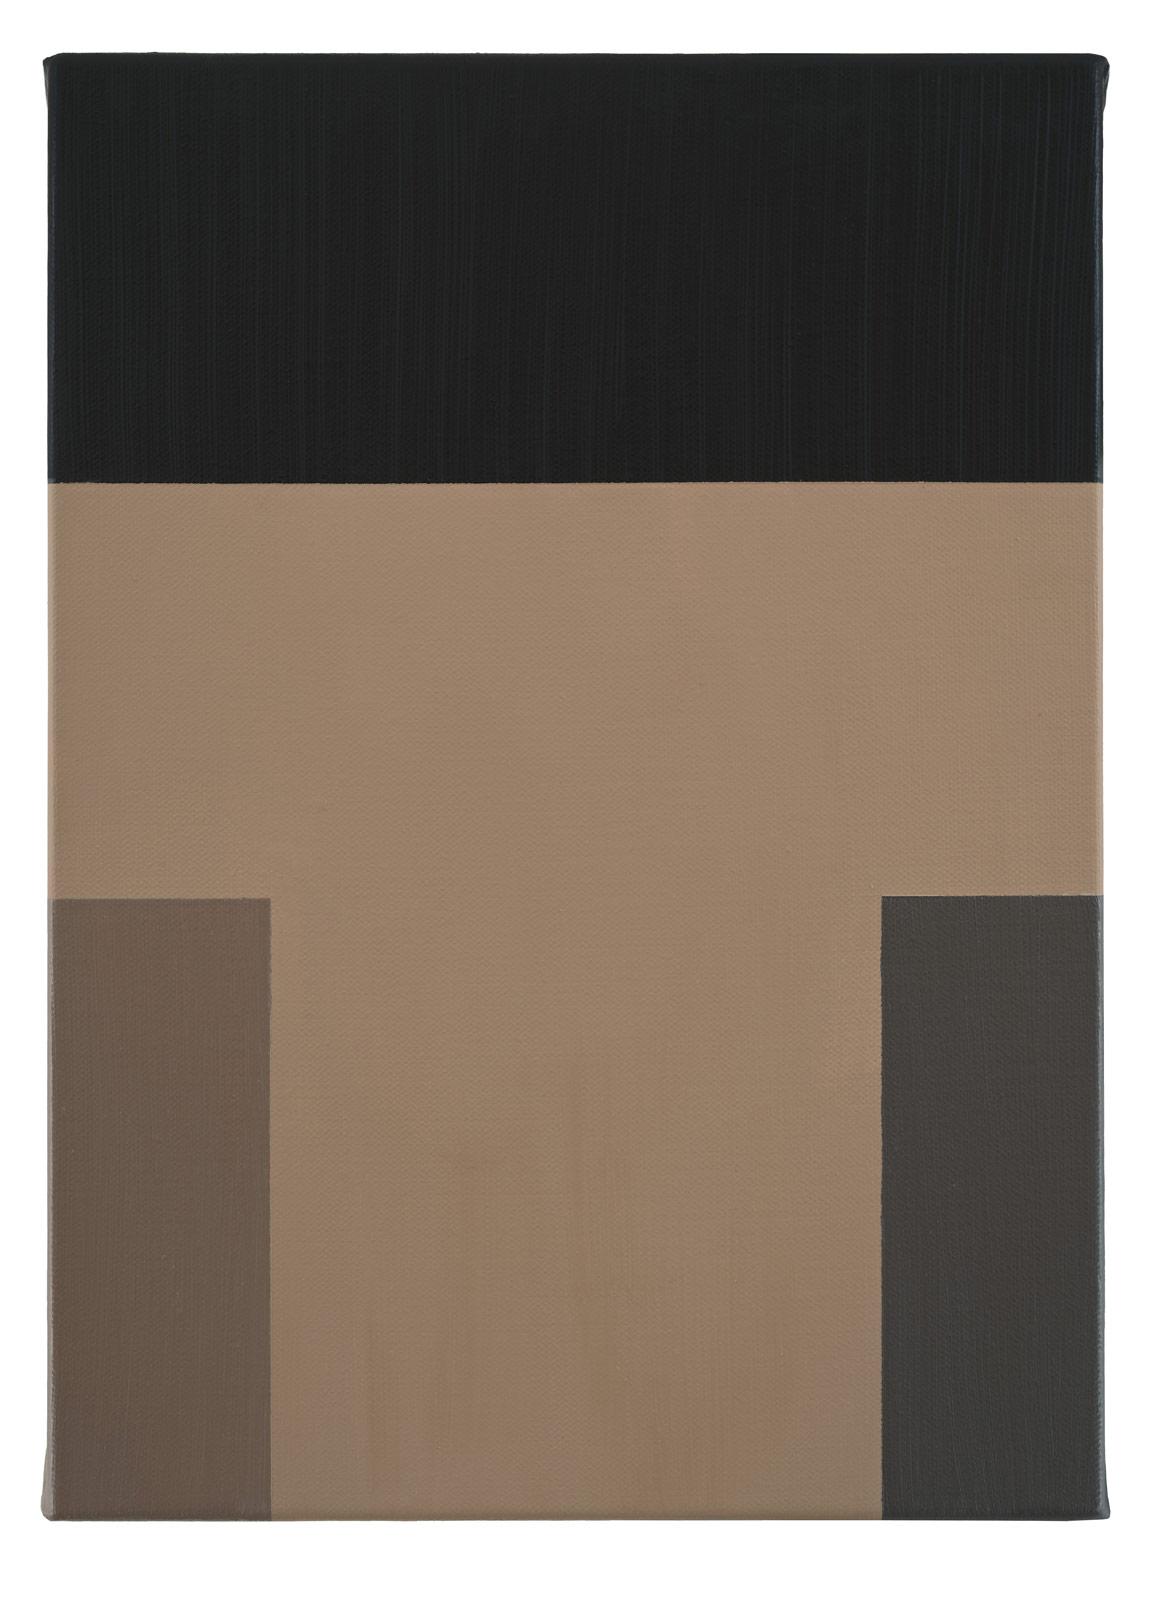 Nöten, 2019. Oil on canvas, 34 x 24,5 x 2 cm